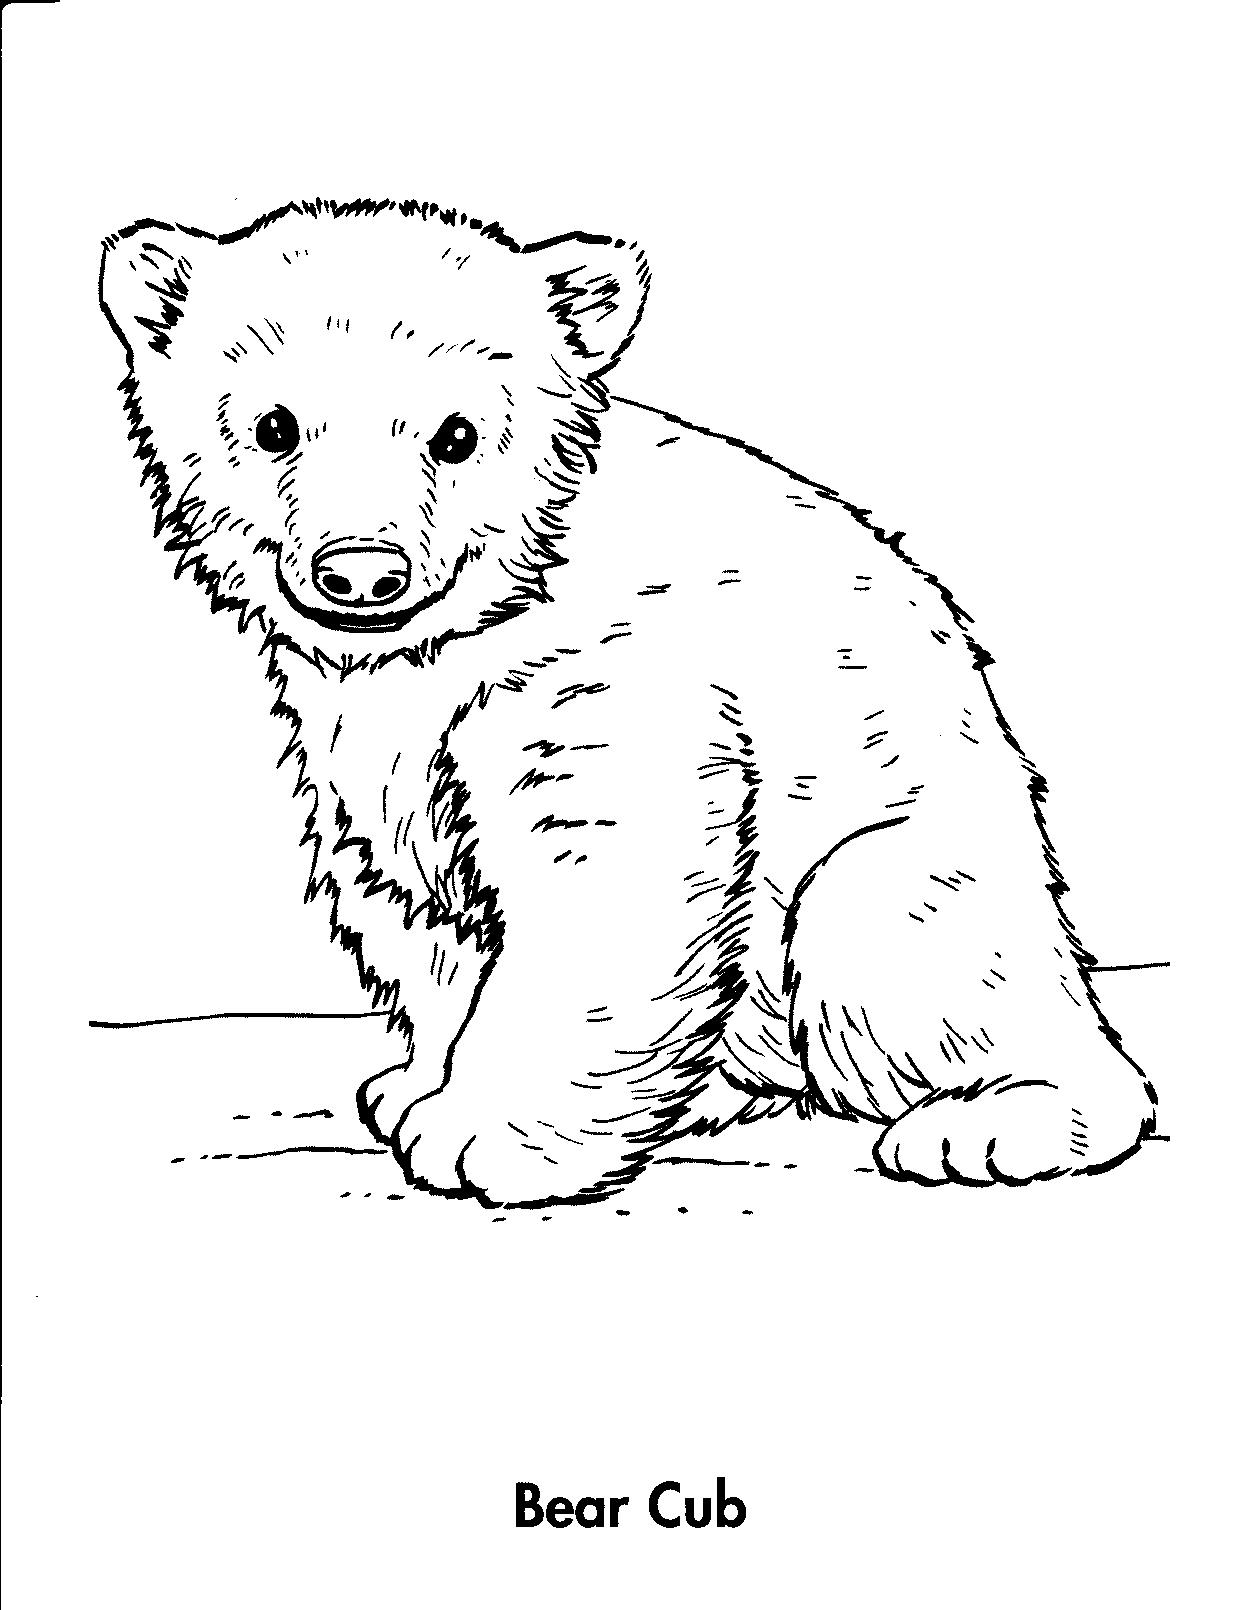 And drawing at getdrawings. Bears clipart bear cub